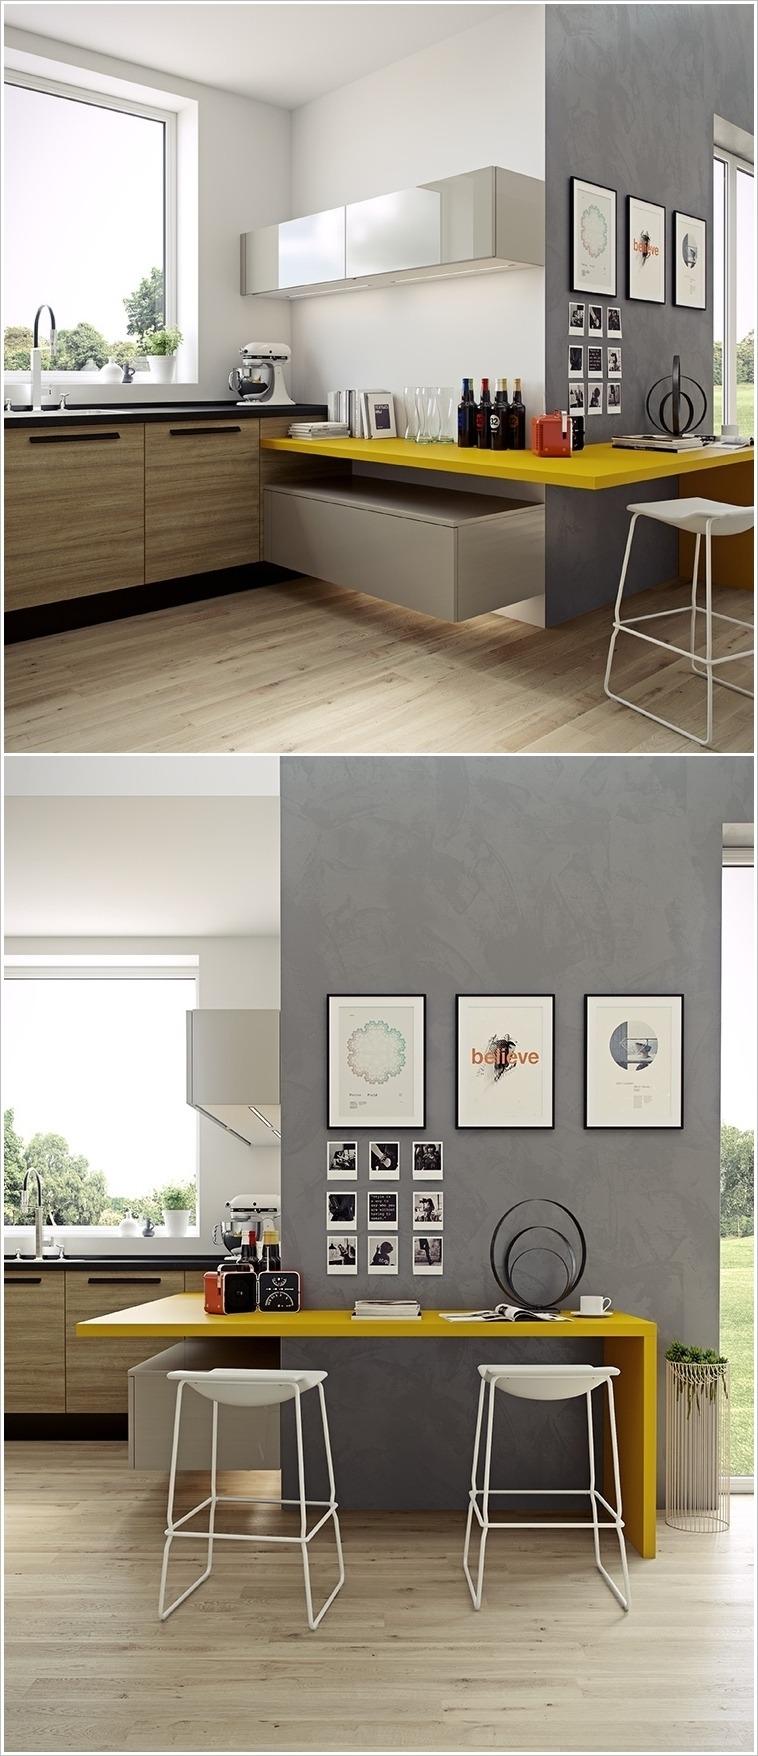 16 Cocinas Ultra Modernas Tikinti ~ Cocinas Pequeñas Para Apartamentos